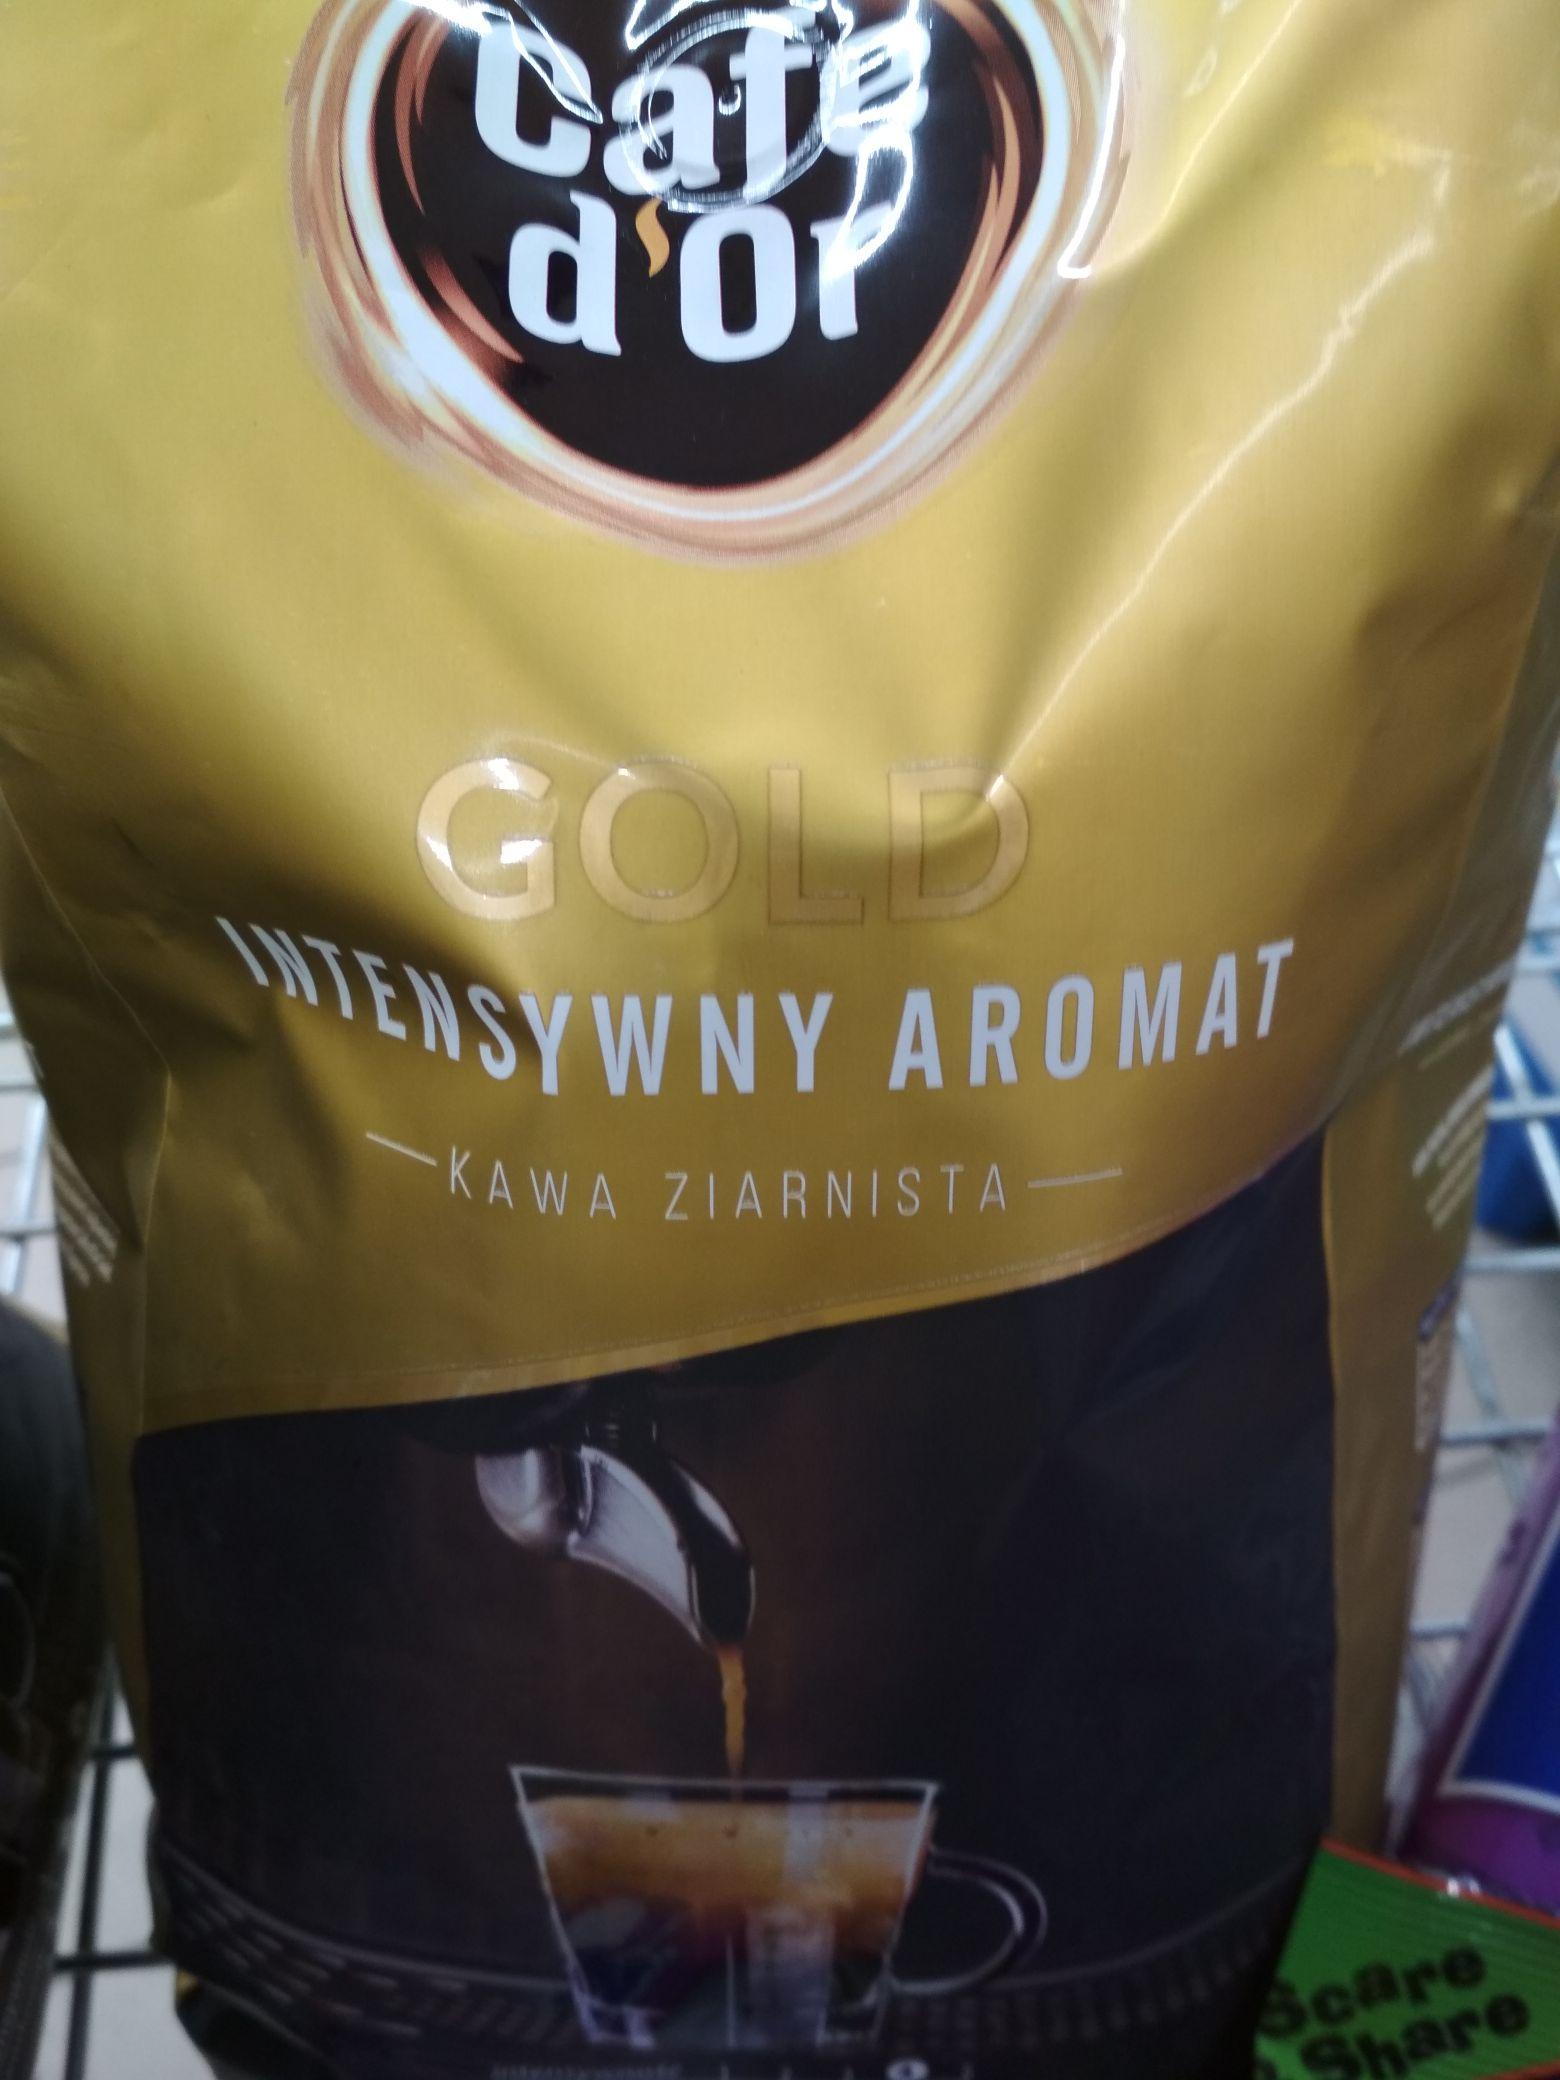 Kawa ziarnista cafe d'or gold 1kg